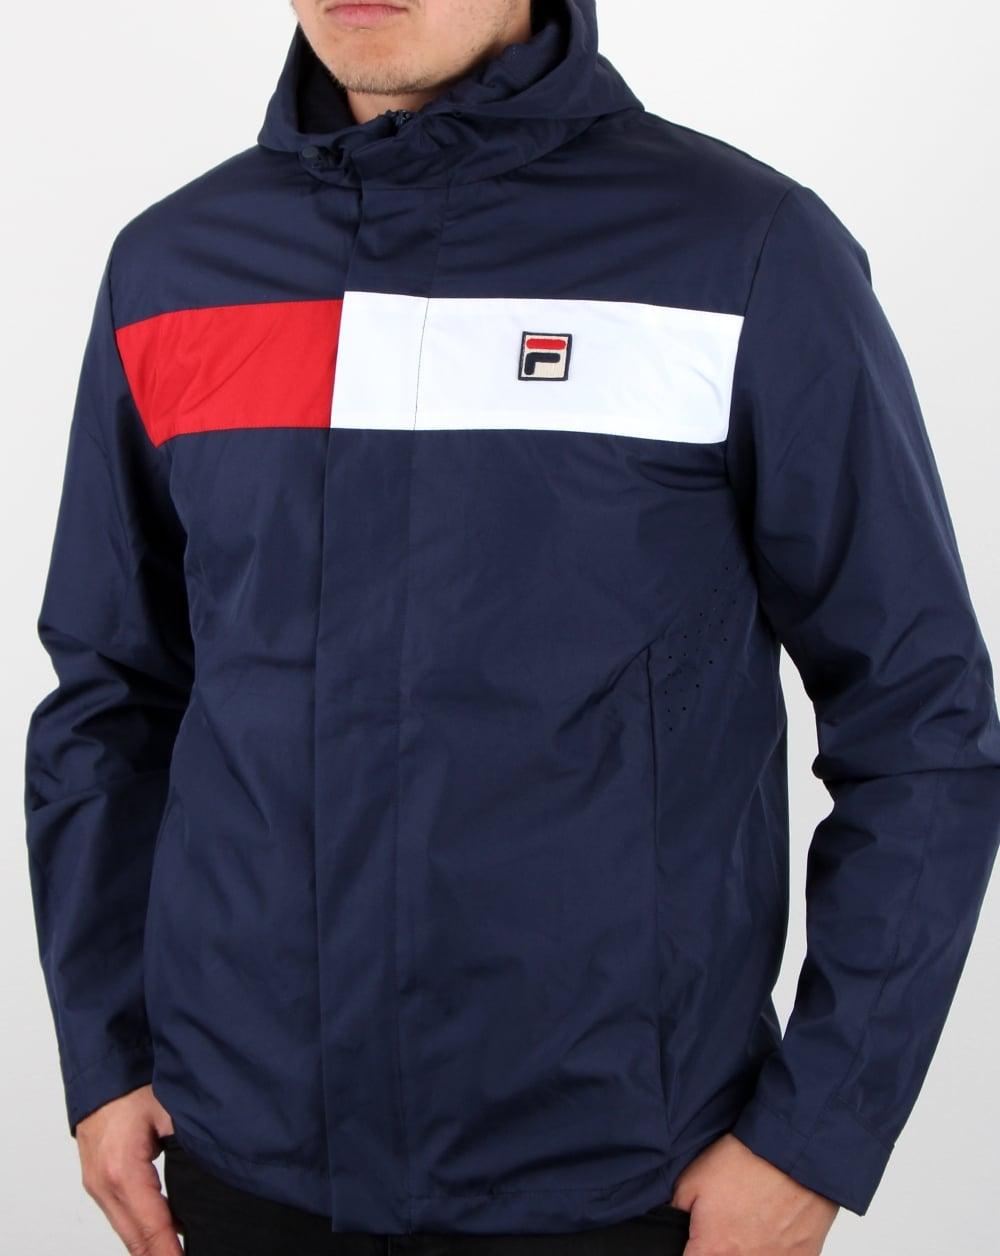 Fila Vintage Cardova Jacket Navy, Men's, Coat